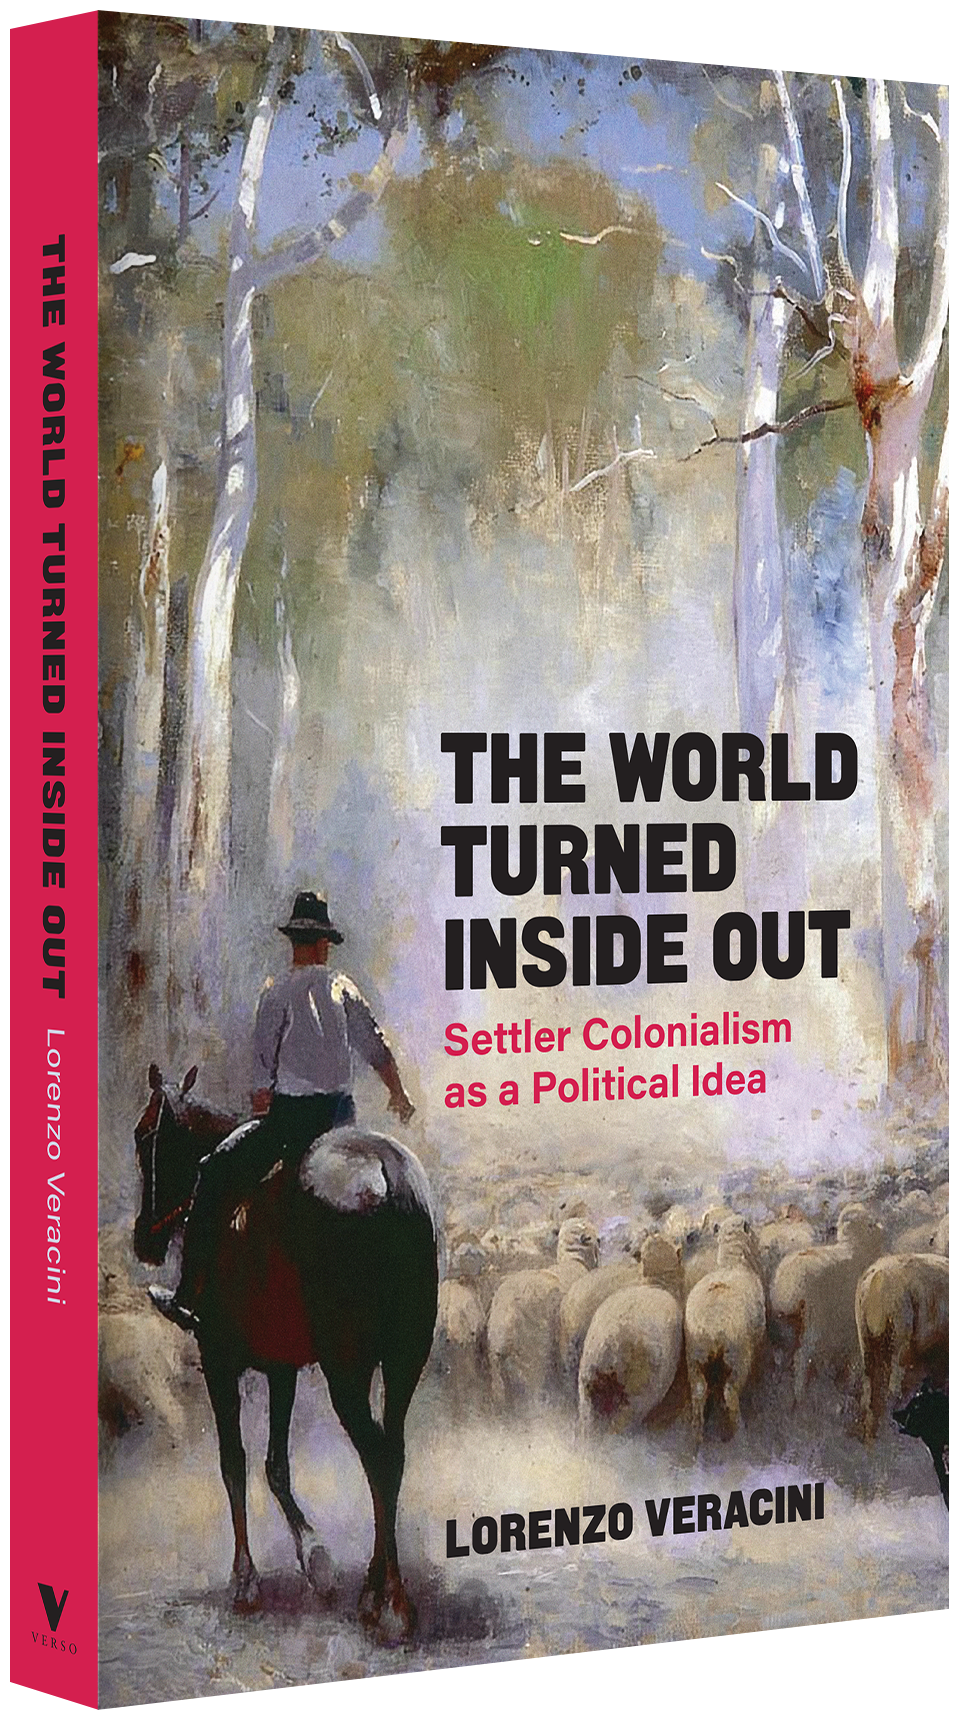 World-turned-inside-out-pb